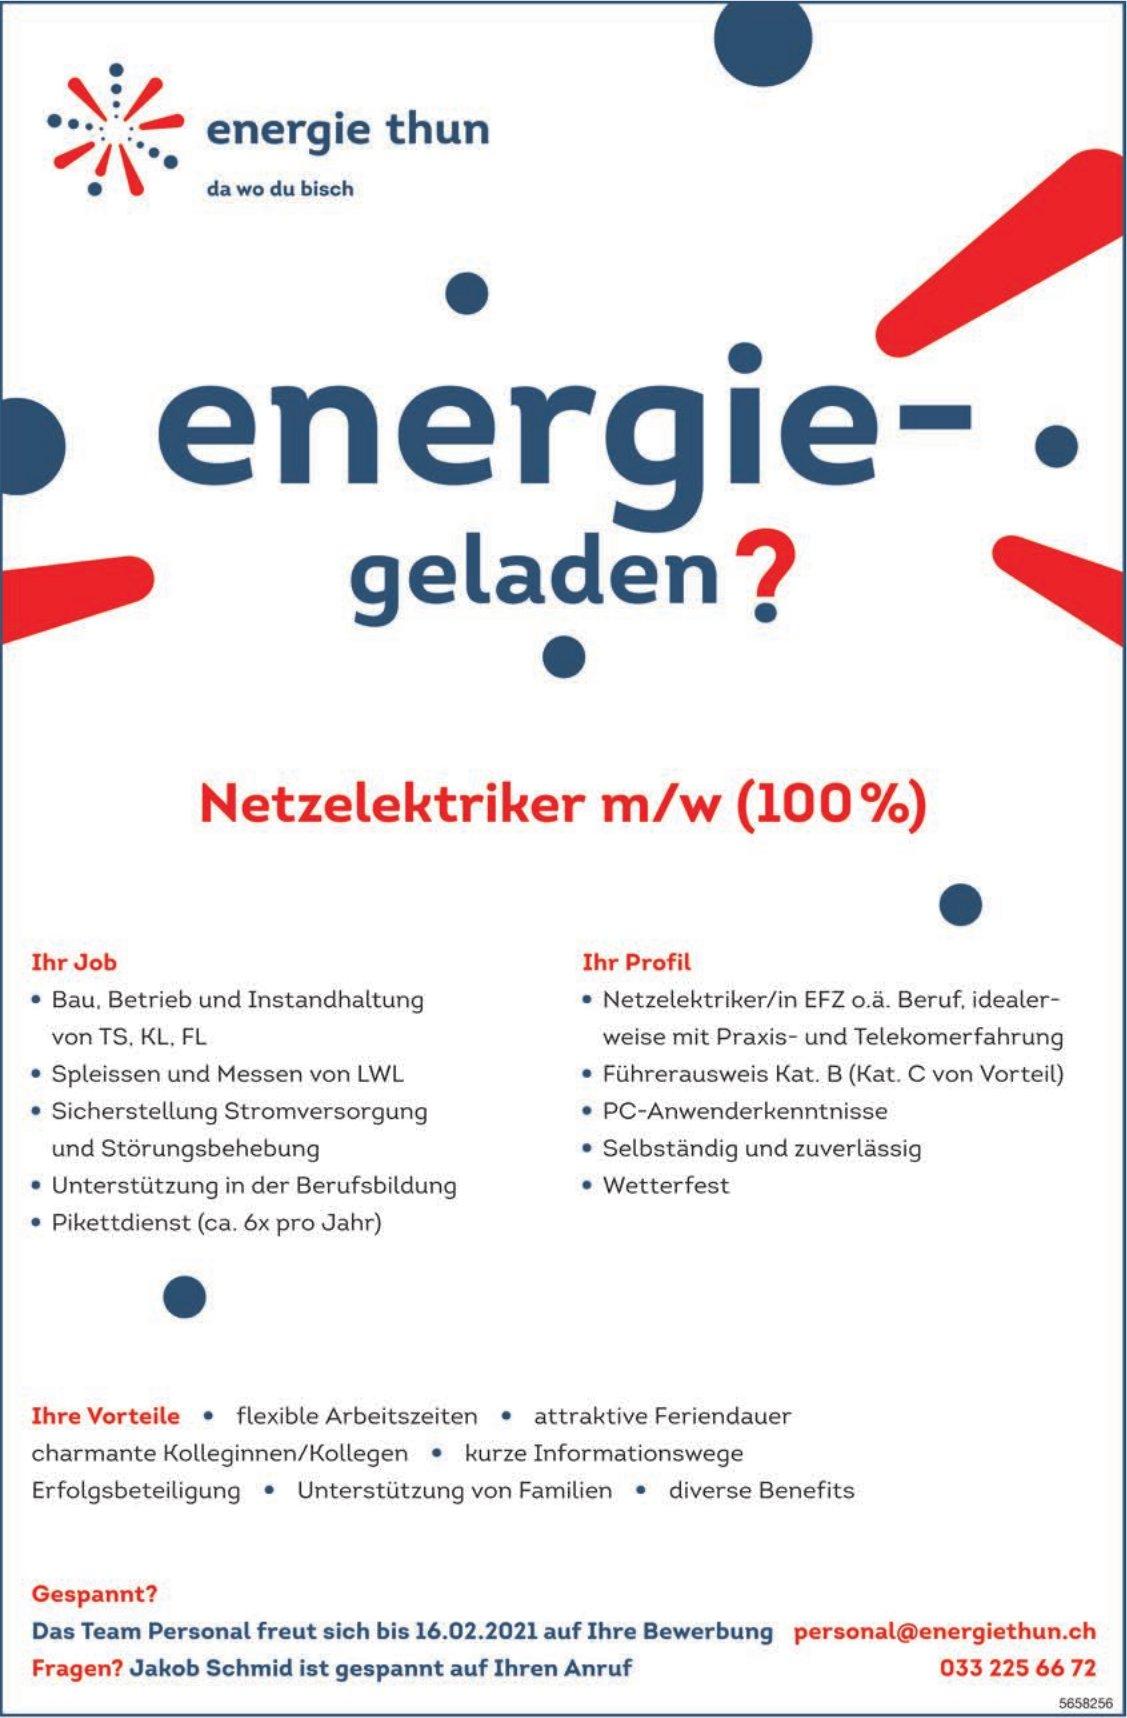 Netzelektriker m/w (100%), Energie Thun, gesucht